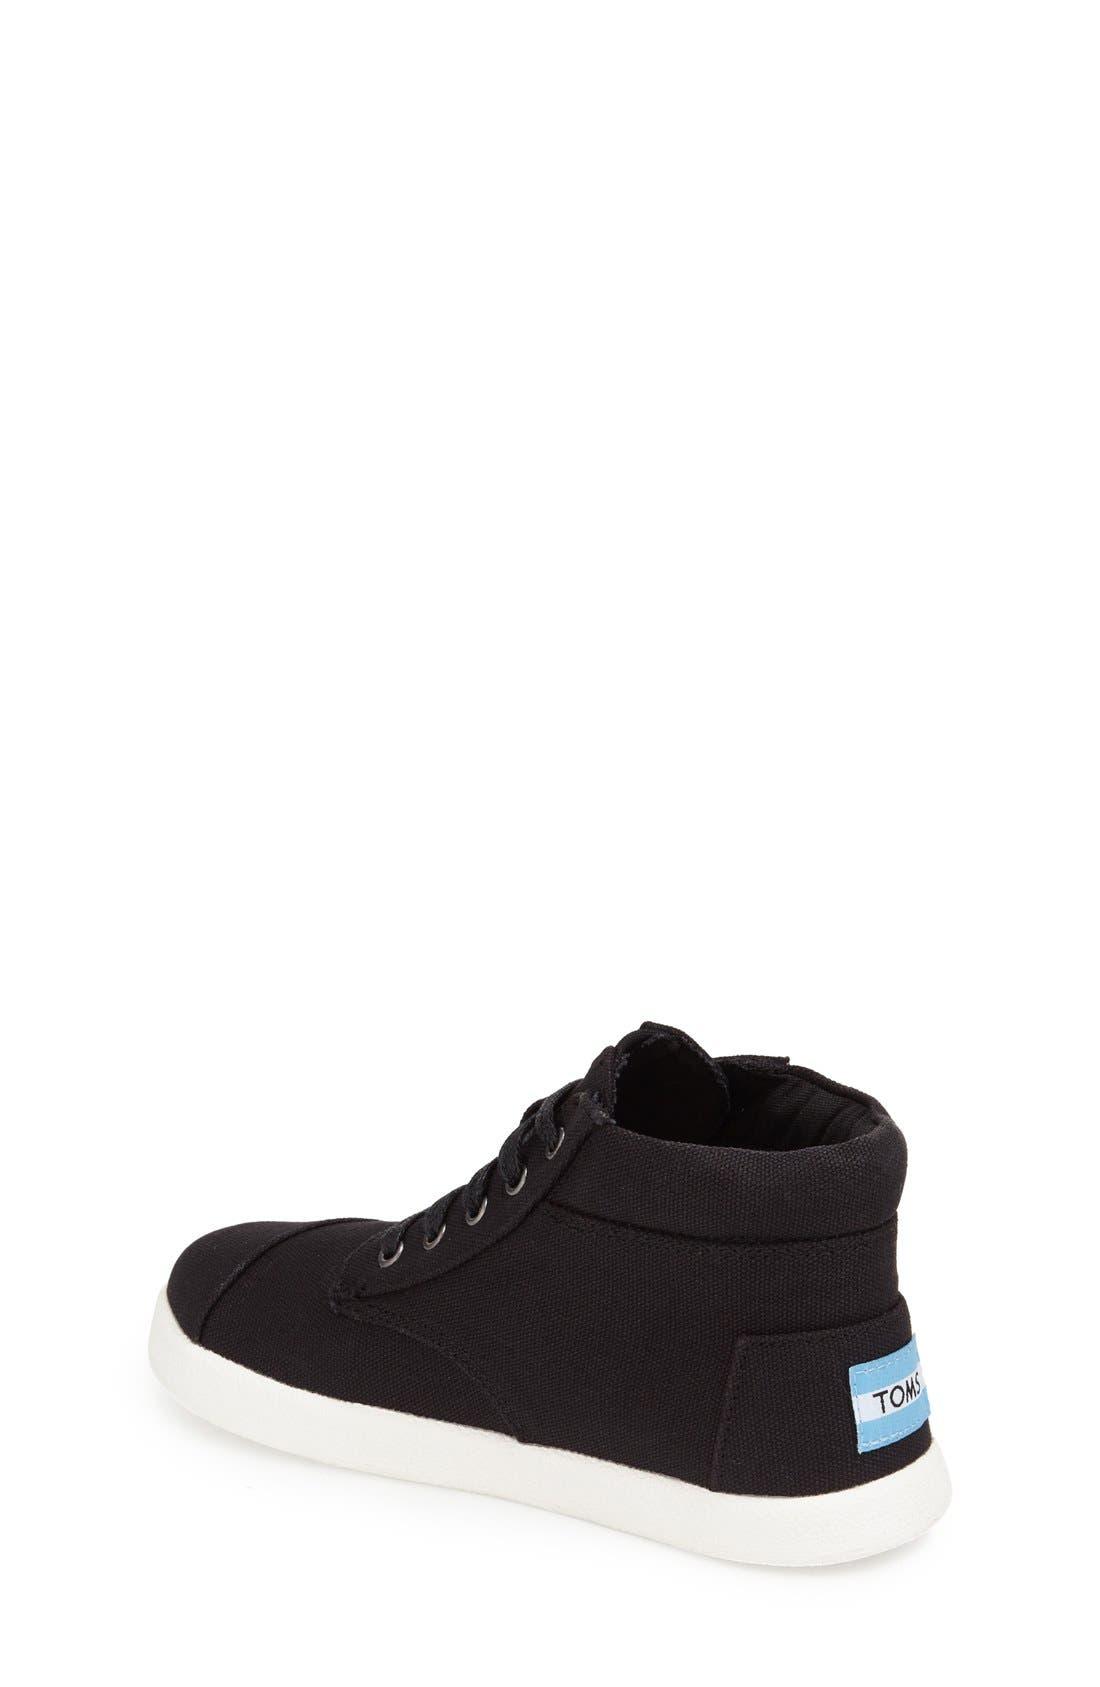 'Paseo' High Top Sneaker,                             Alternate thumbnail 2, color,                             BLACK